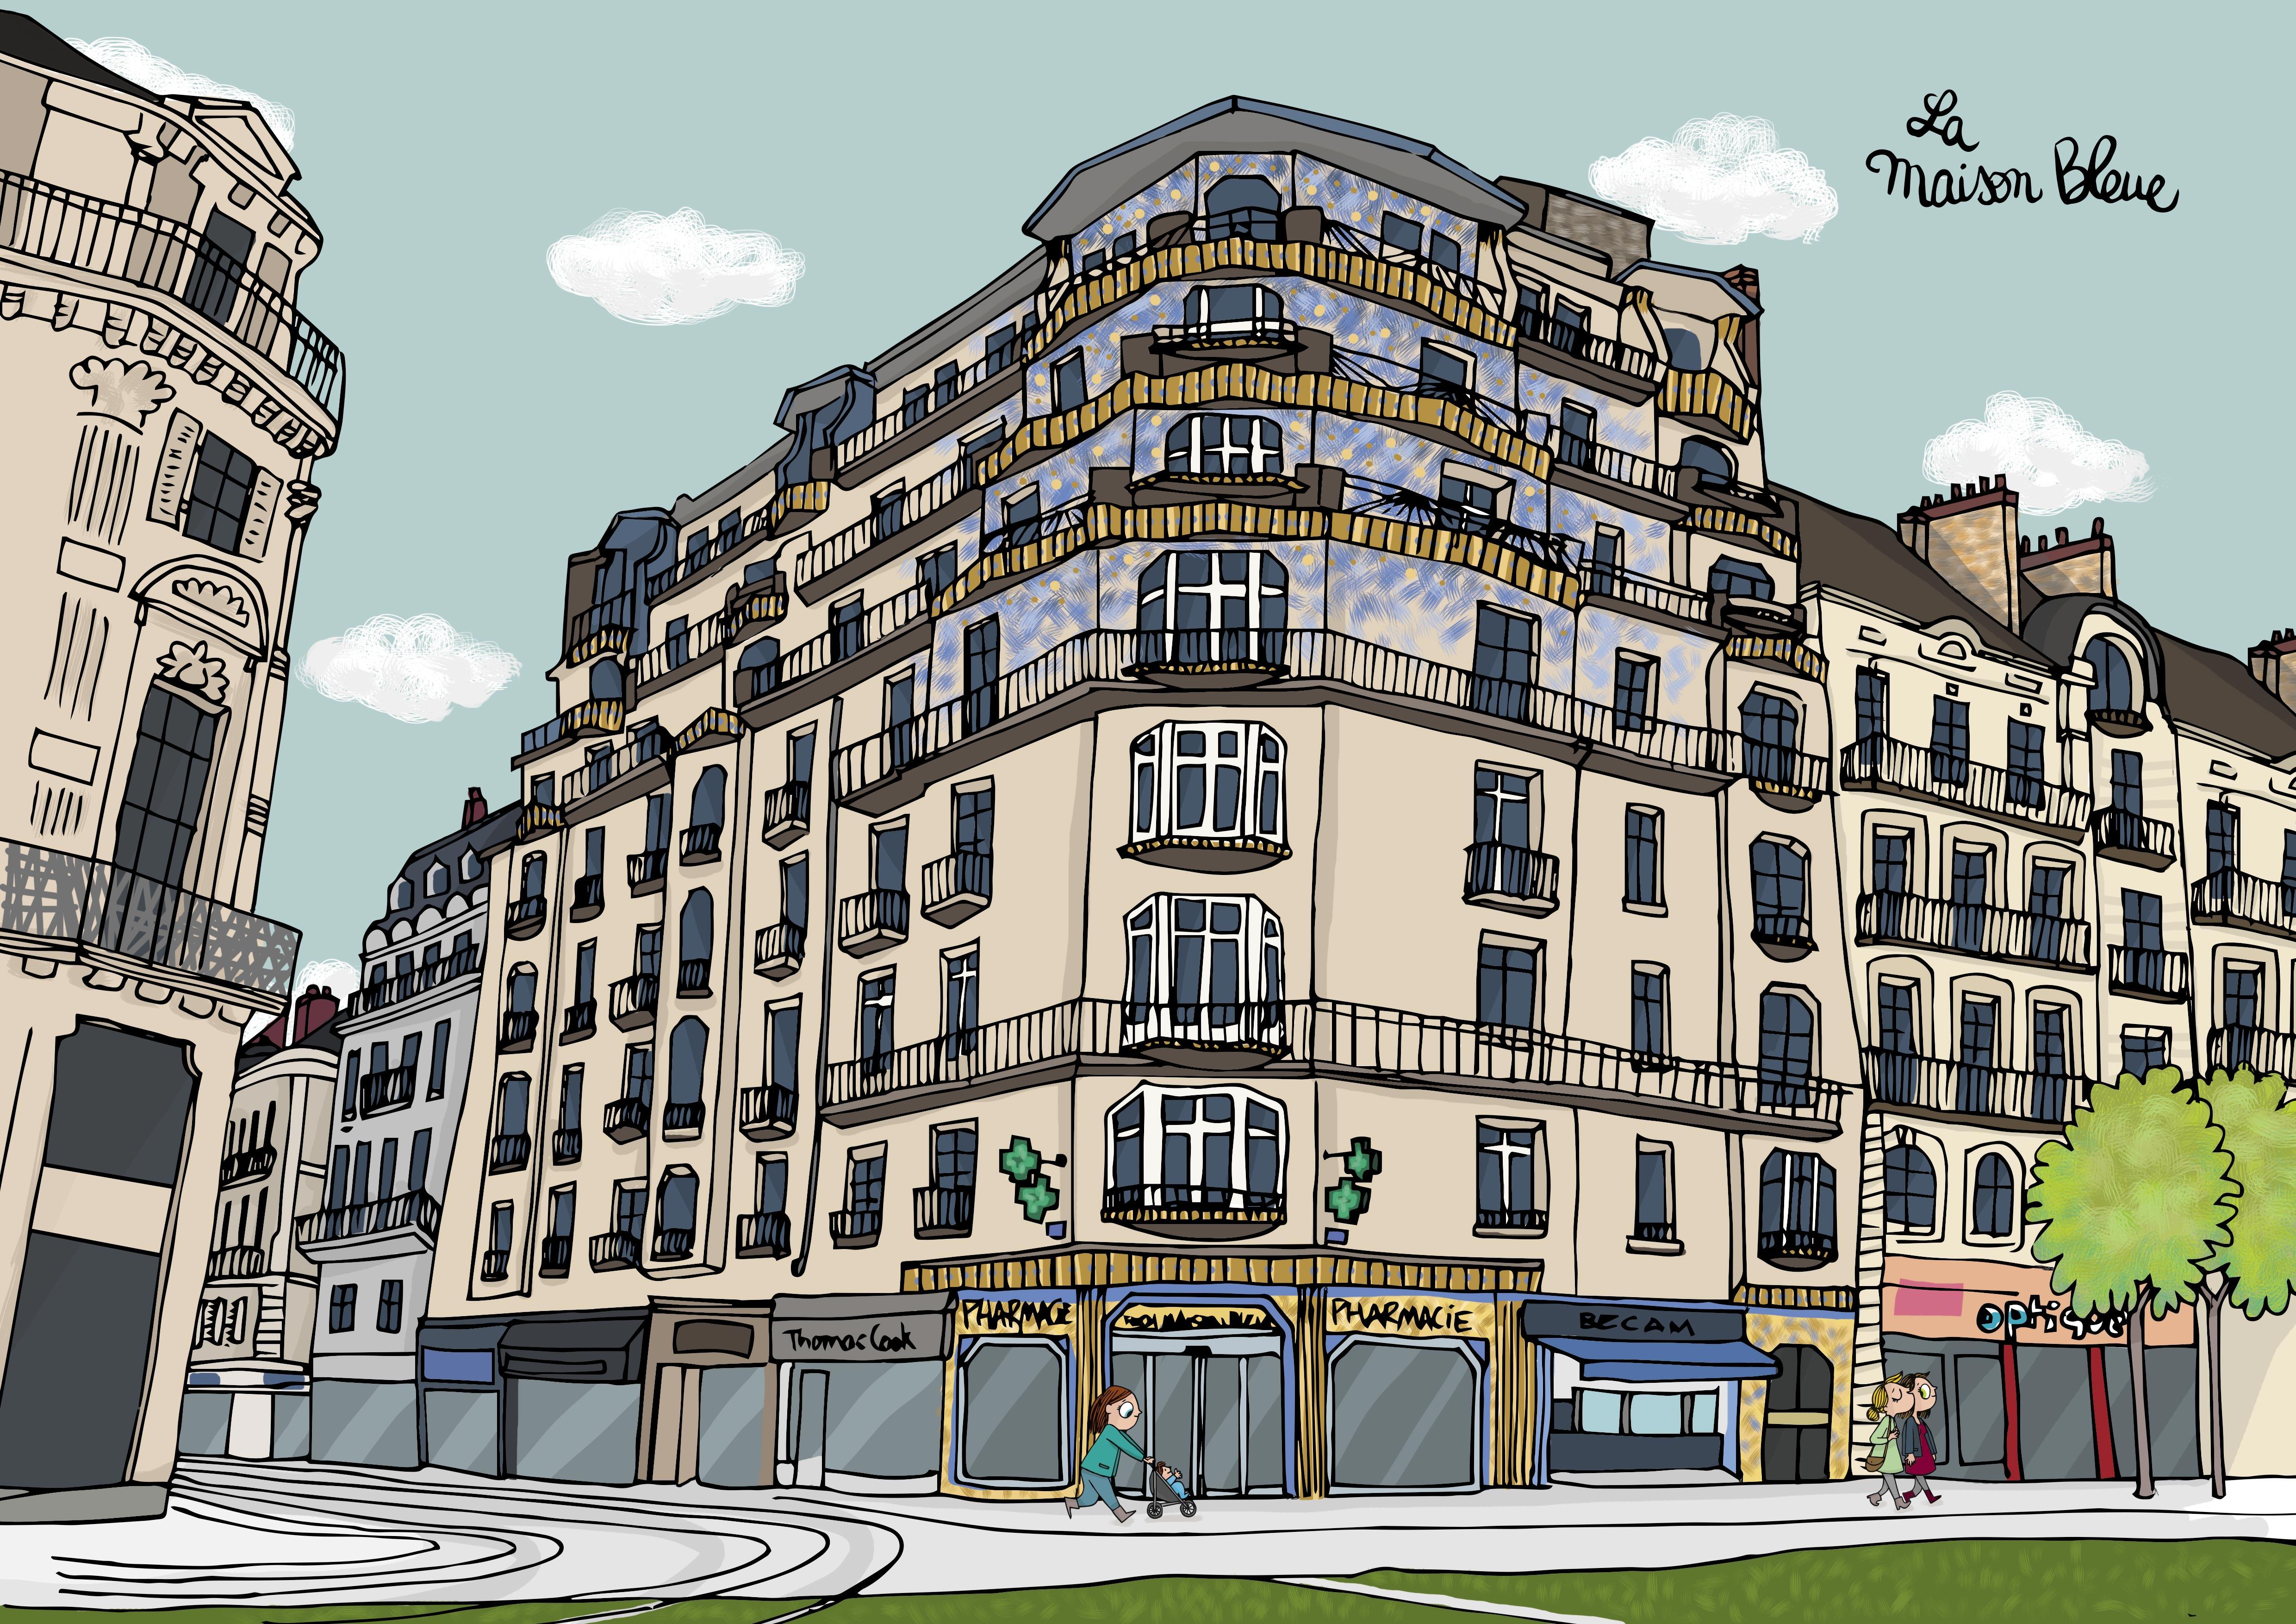 Illustration Maison Bleu Angers